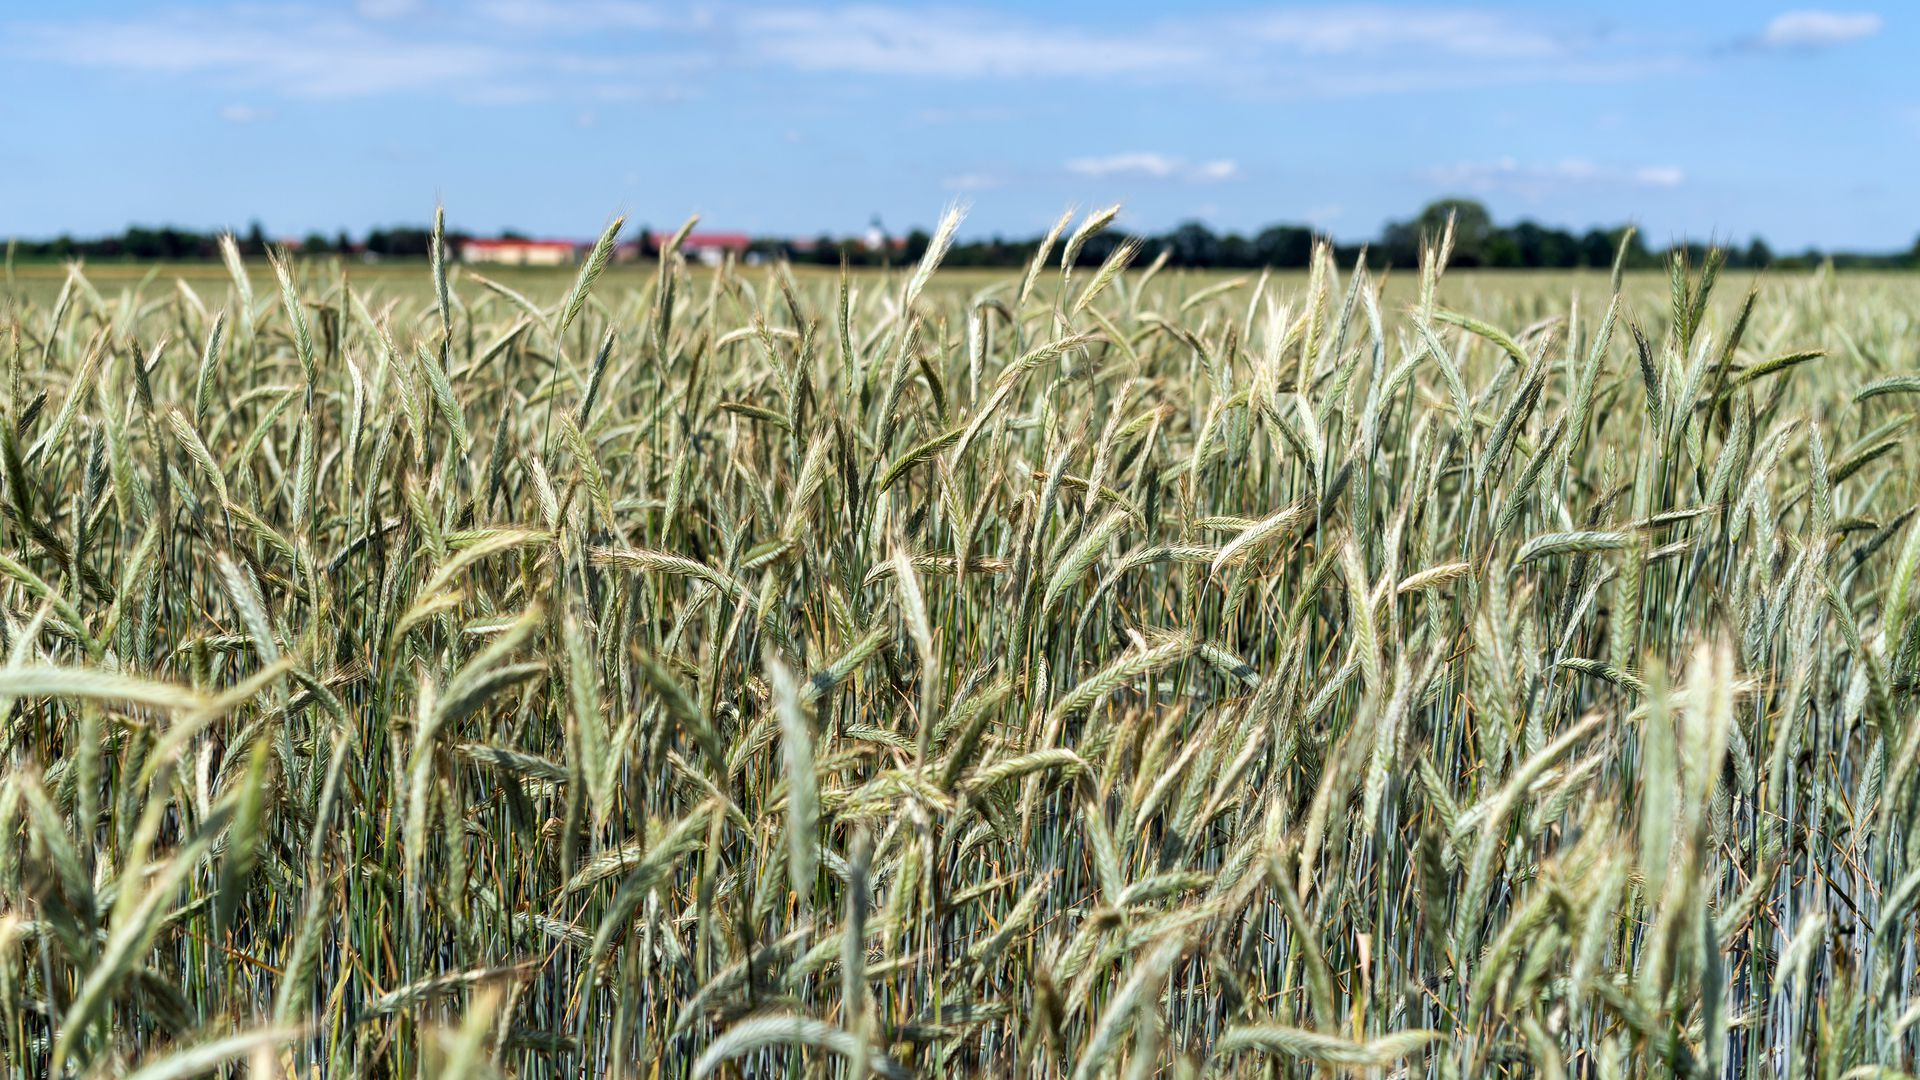 A cornfield.